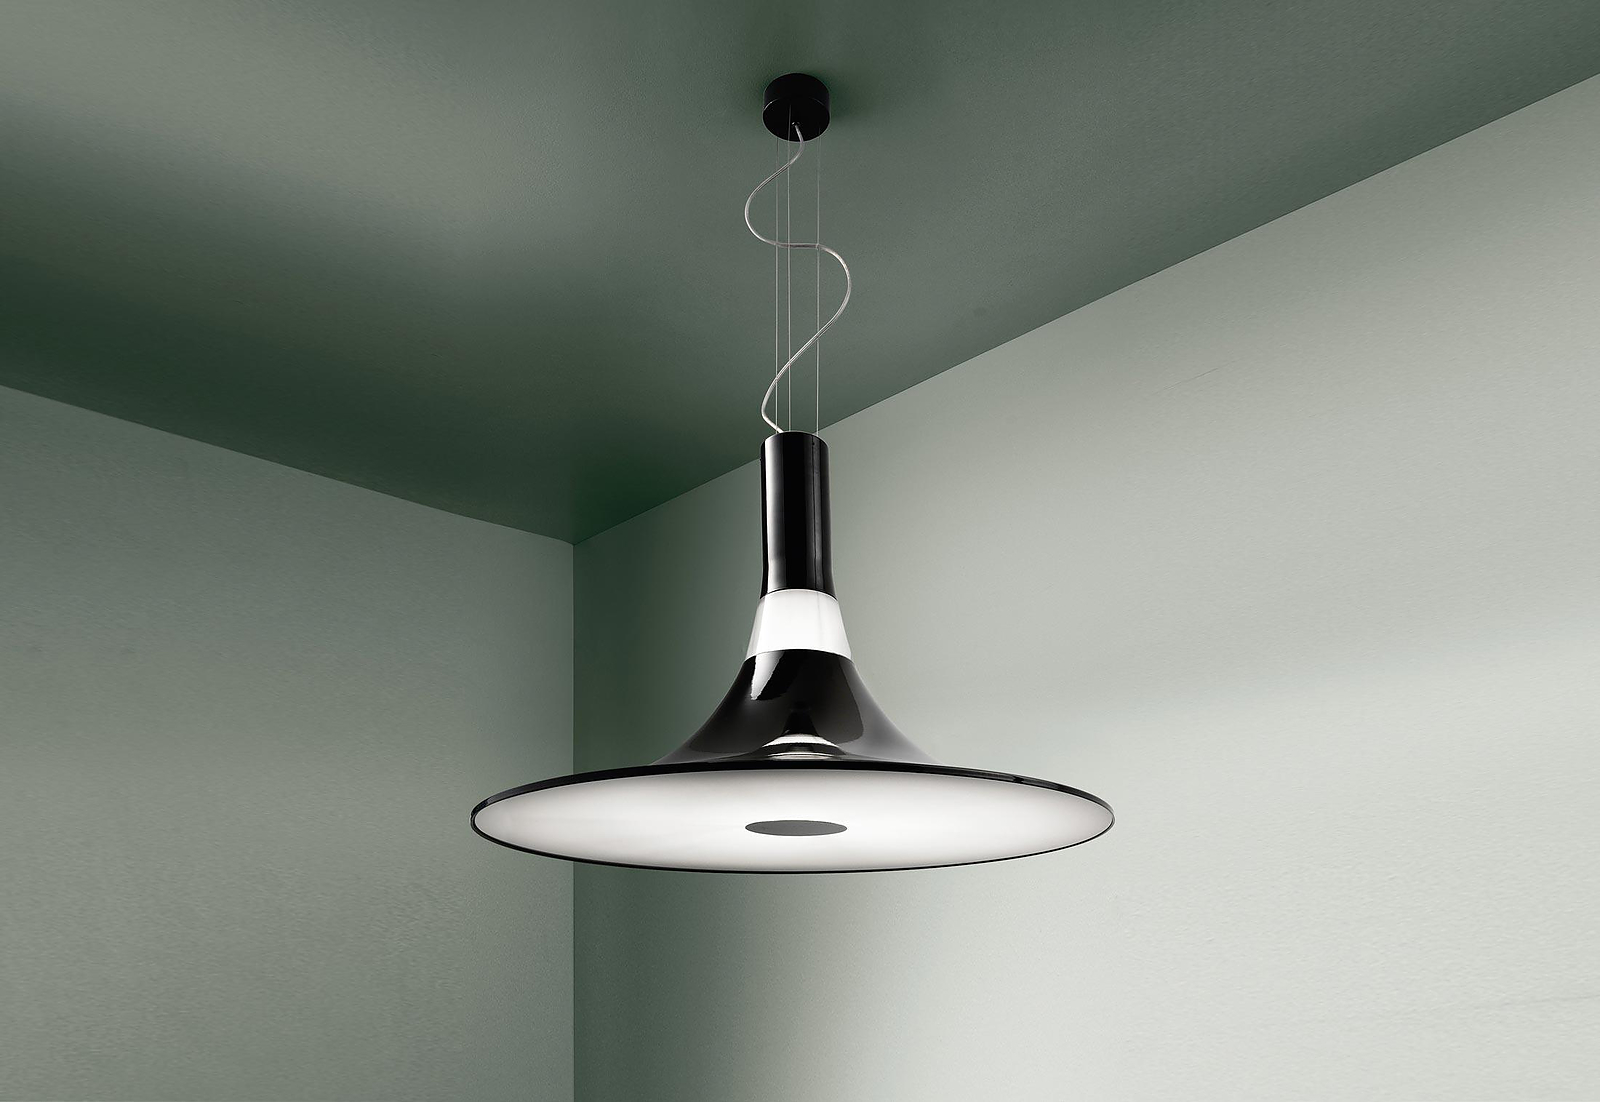 Icon Lamp by V12 Design for I TRE.